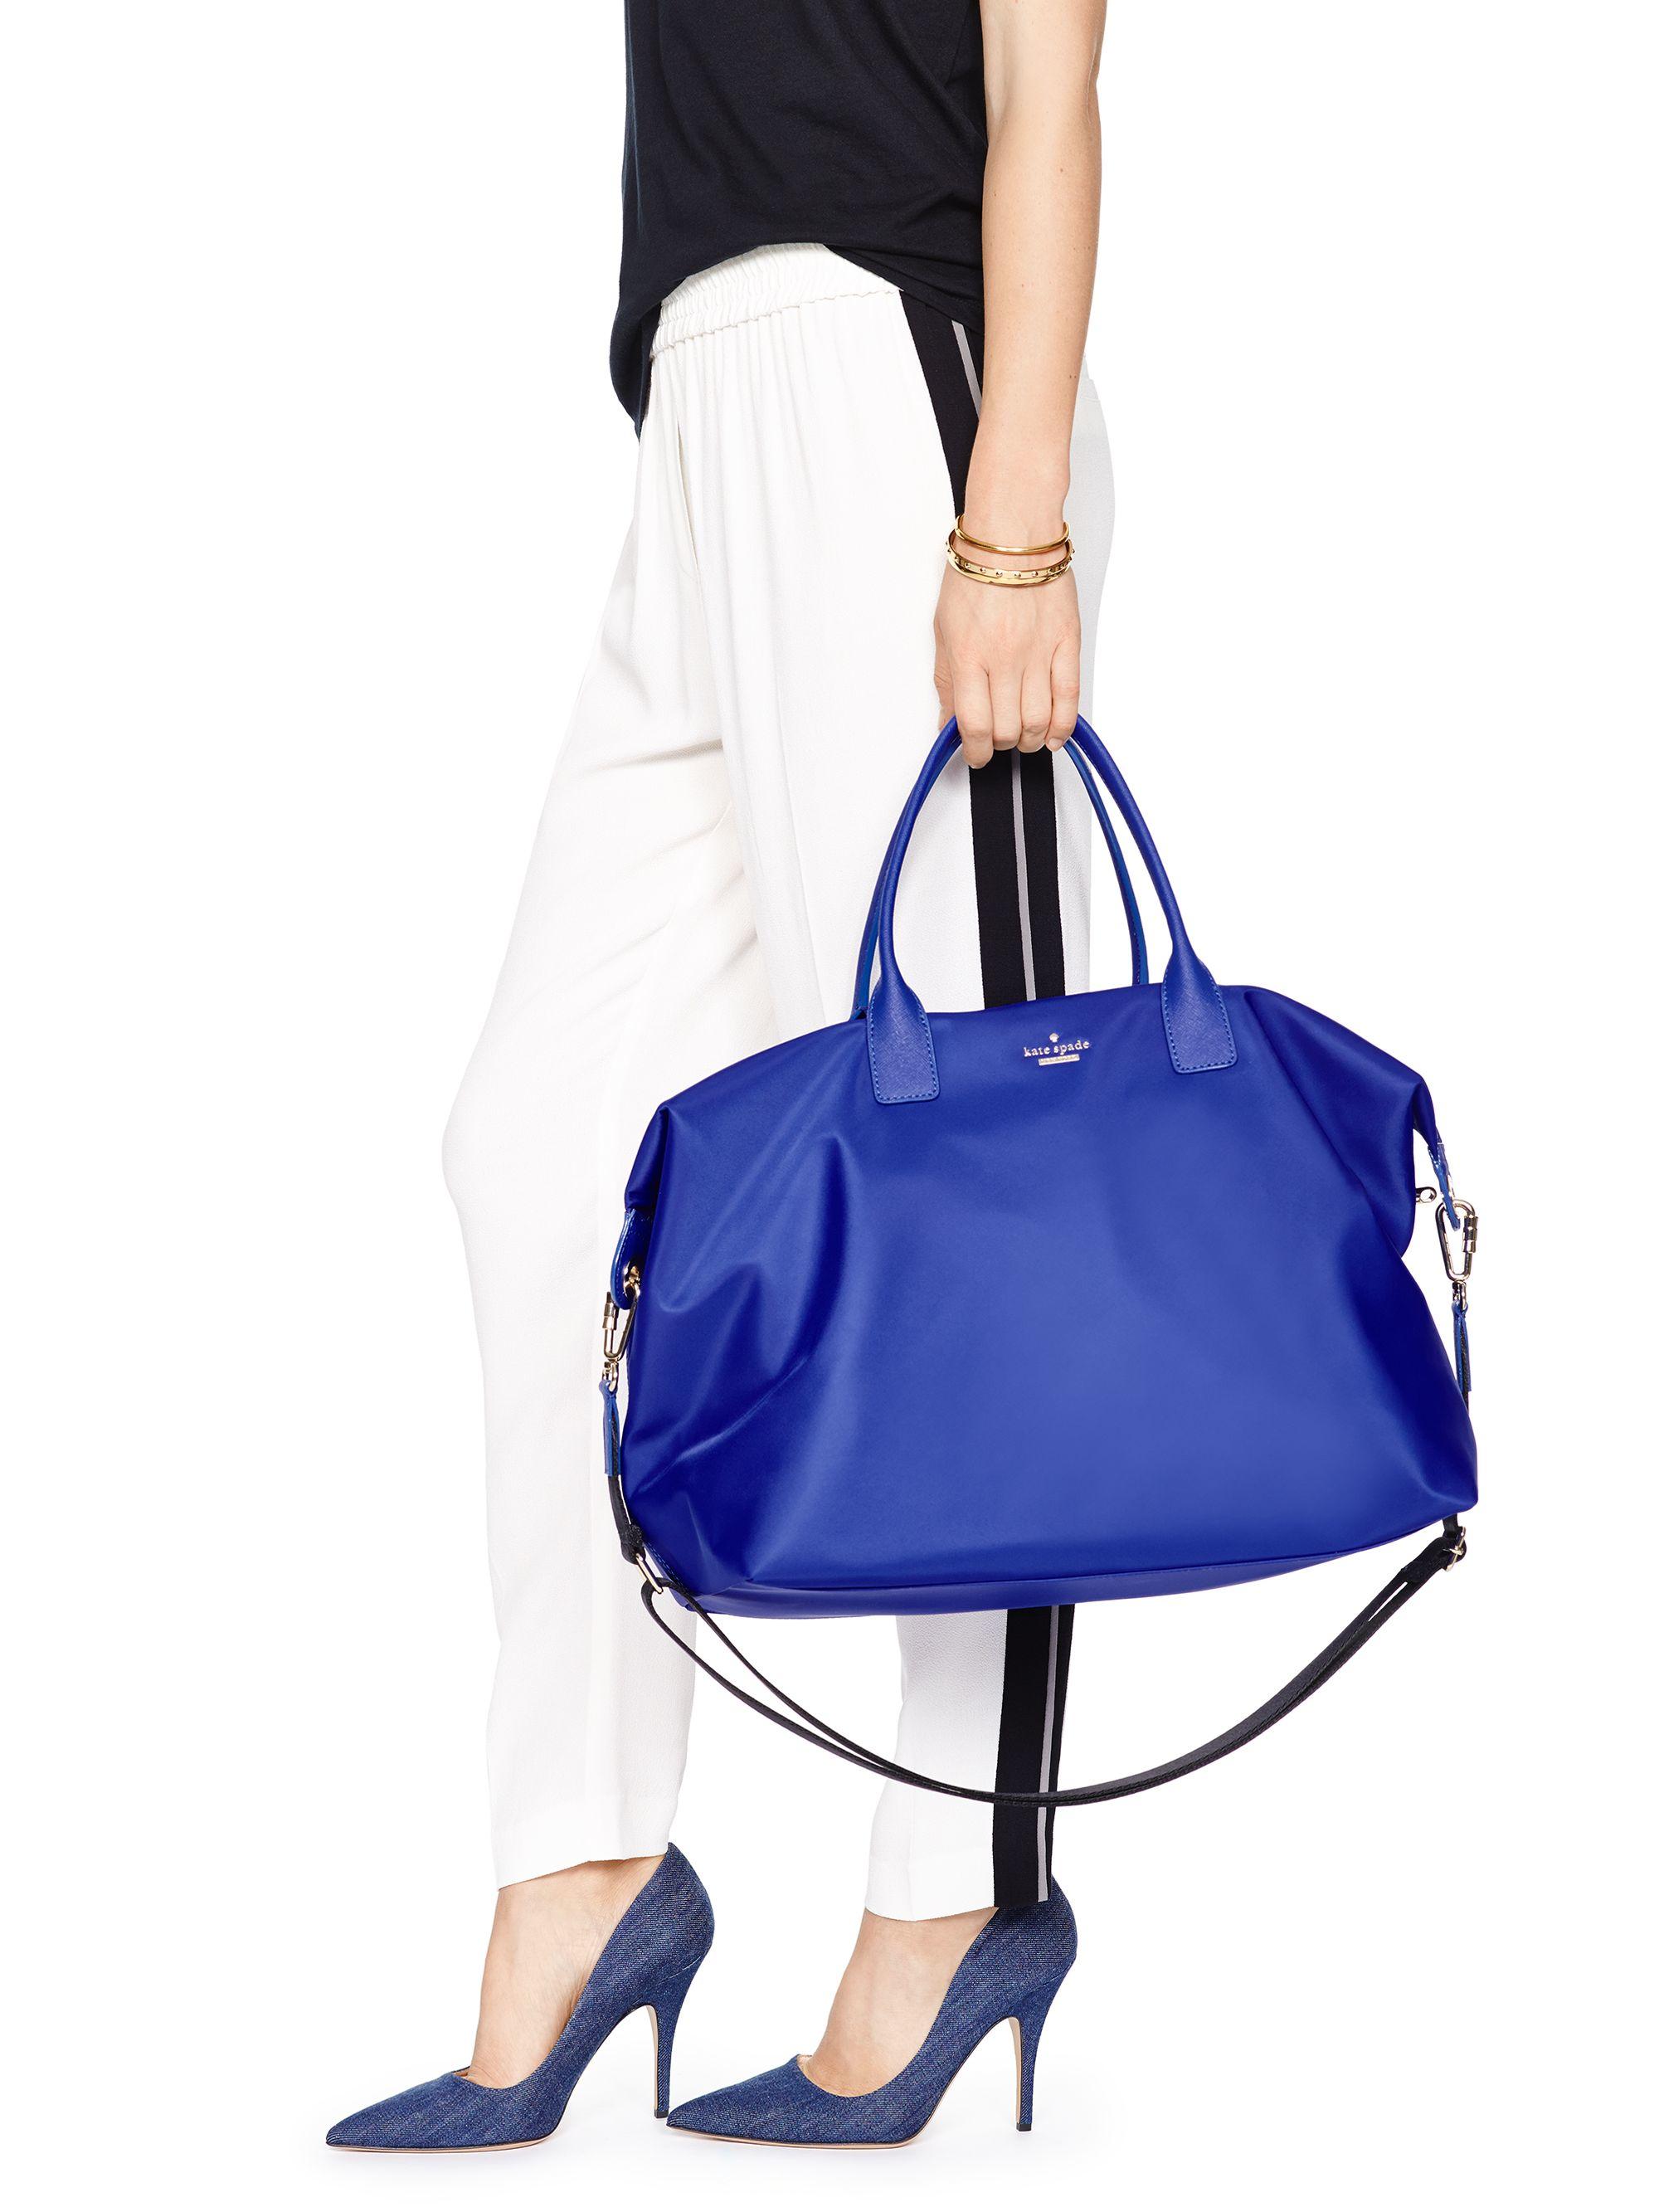 Kate spade new york Classic Nylon Lyla Weekender in Blue | Lyst